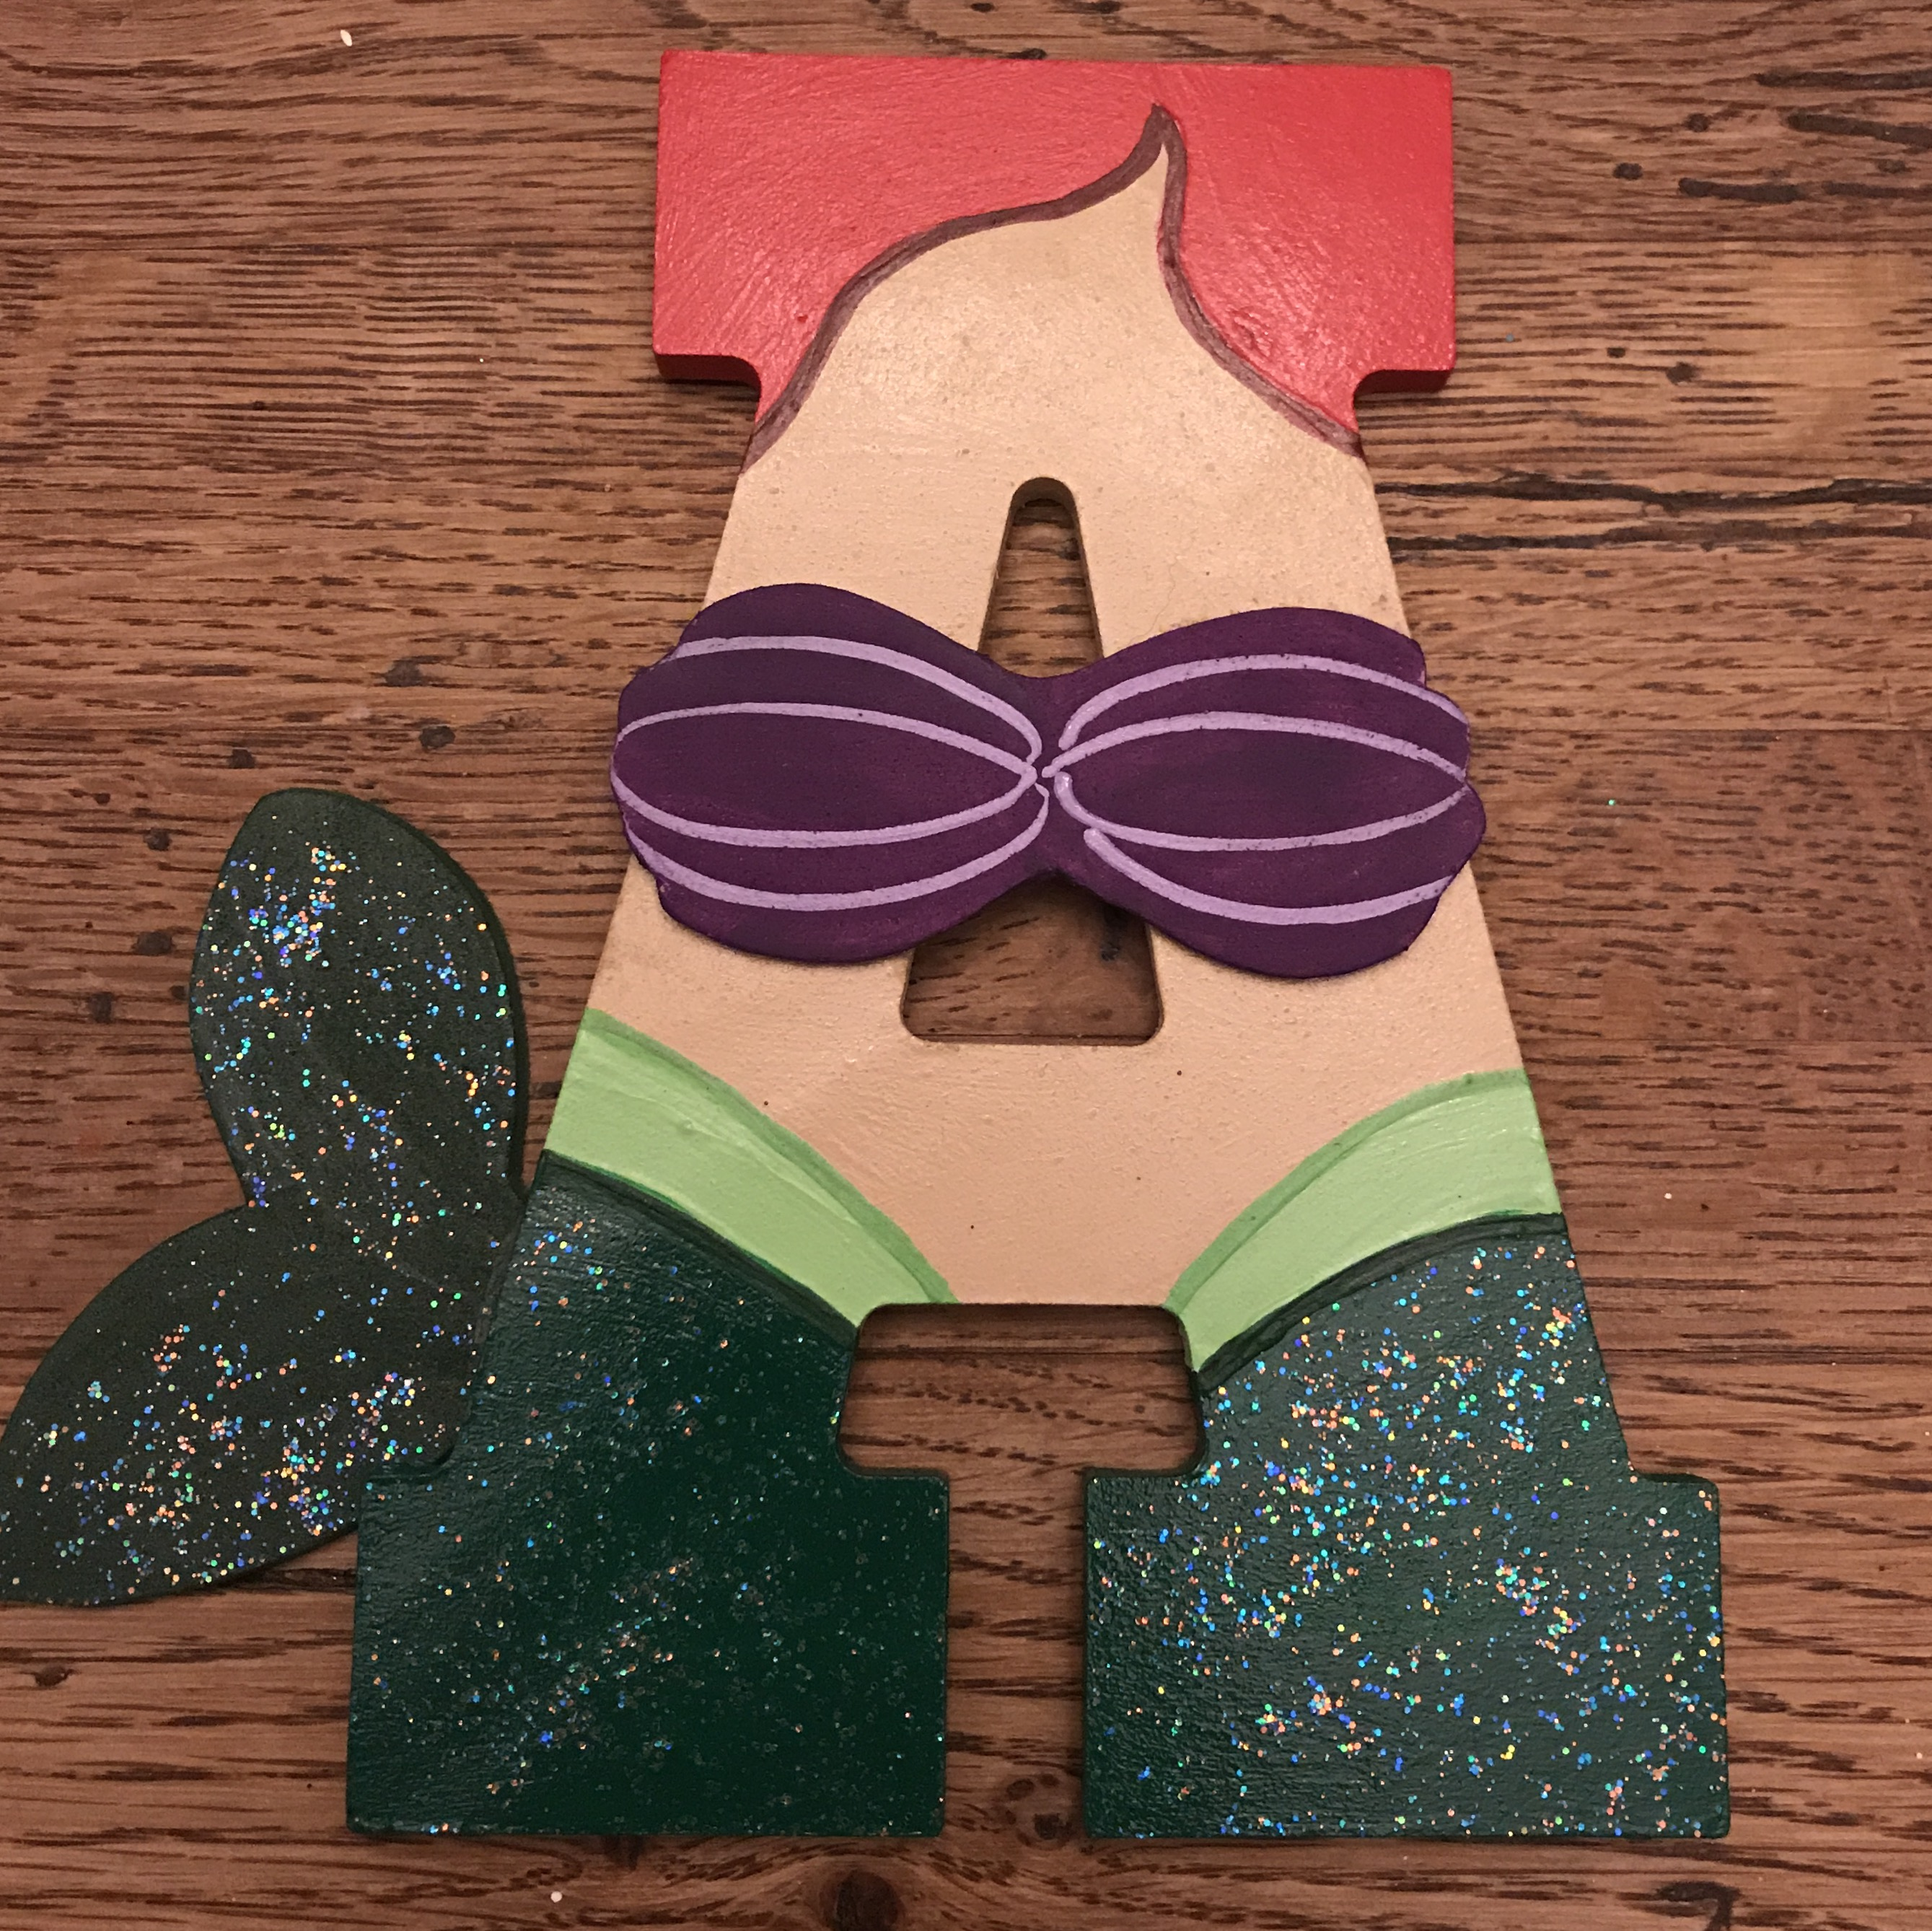 Disney Princess Ariel Little Mermaid Wooden Letters Artsy Autly